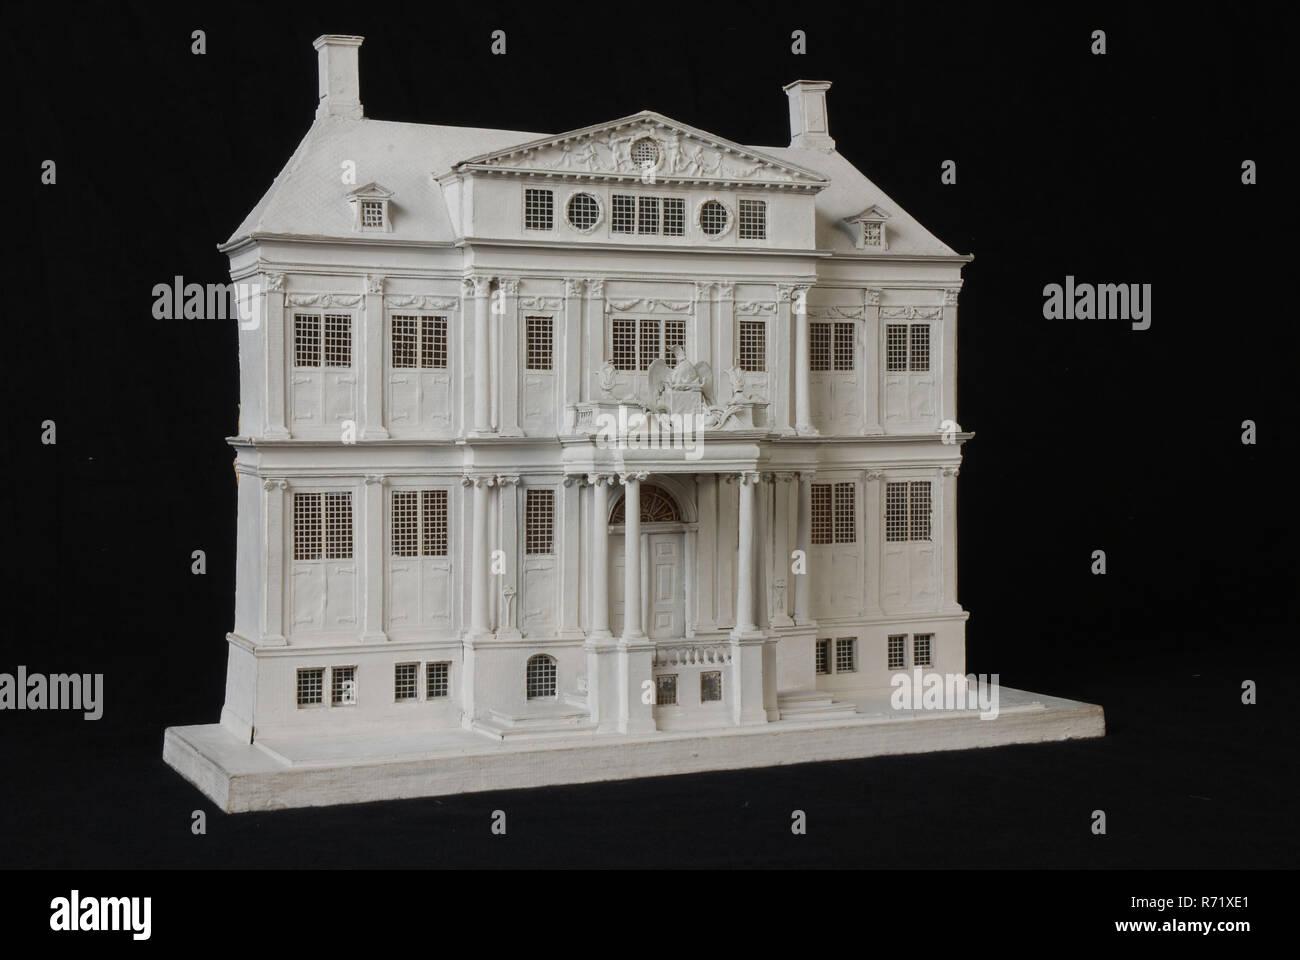 Model of frontage Schielandshuis on wooden base plate, building model model cardboard paint wood, base plate) Schielandshuis Rotterdam City Center Stadsdriehoek - Stock Image